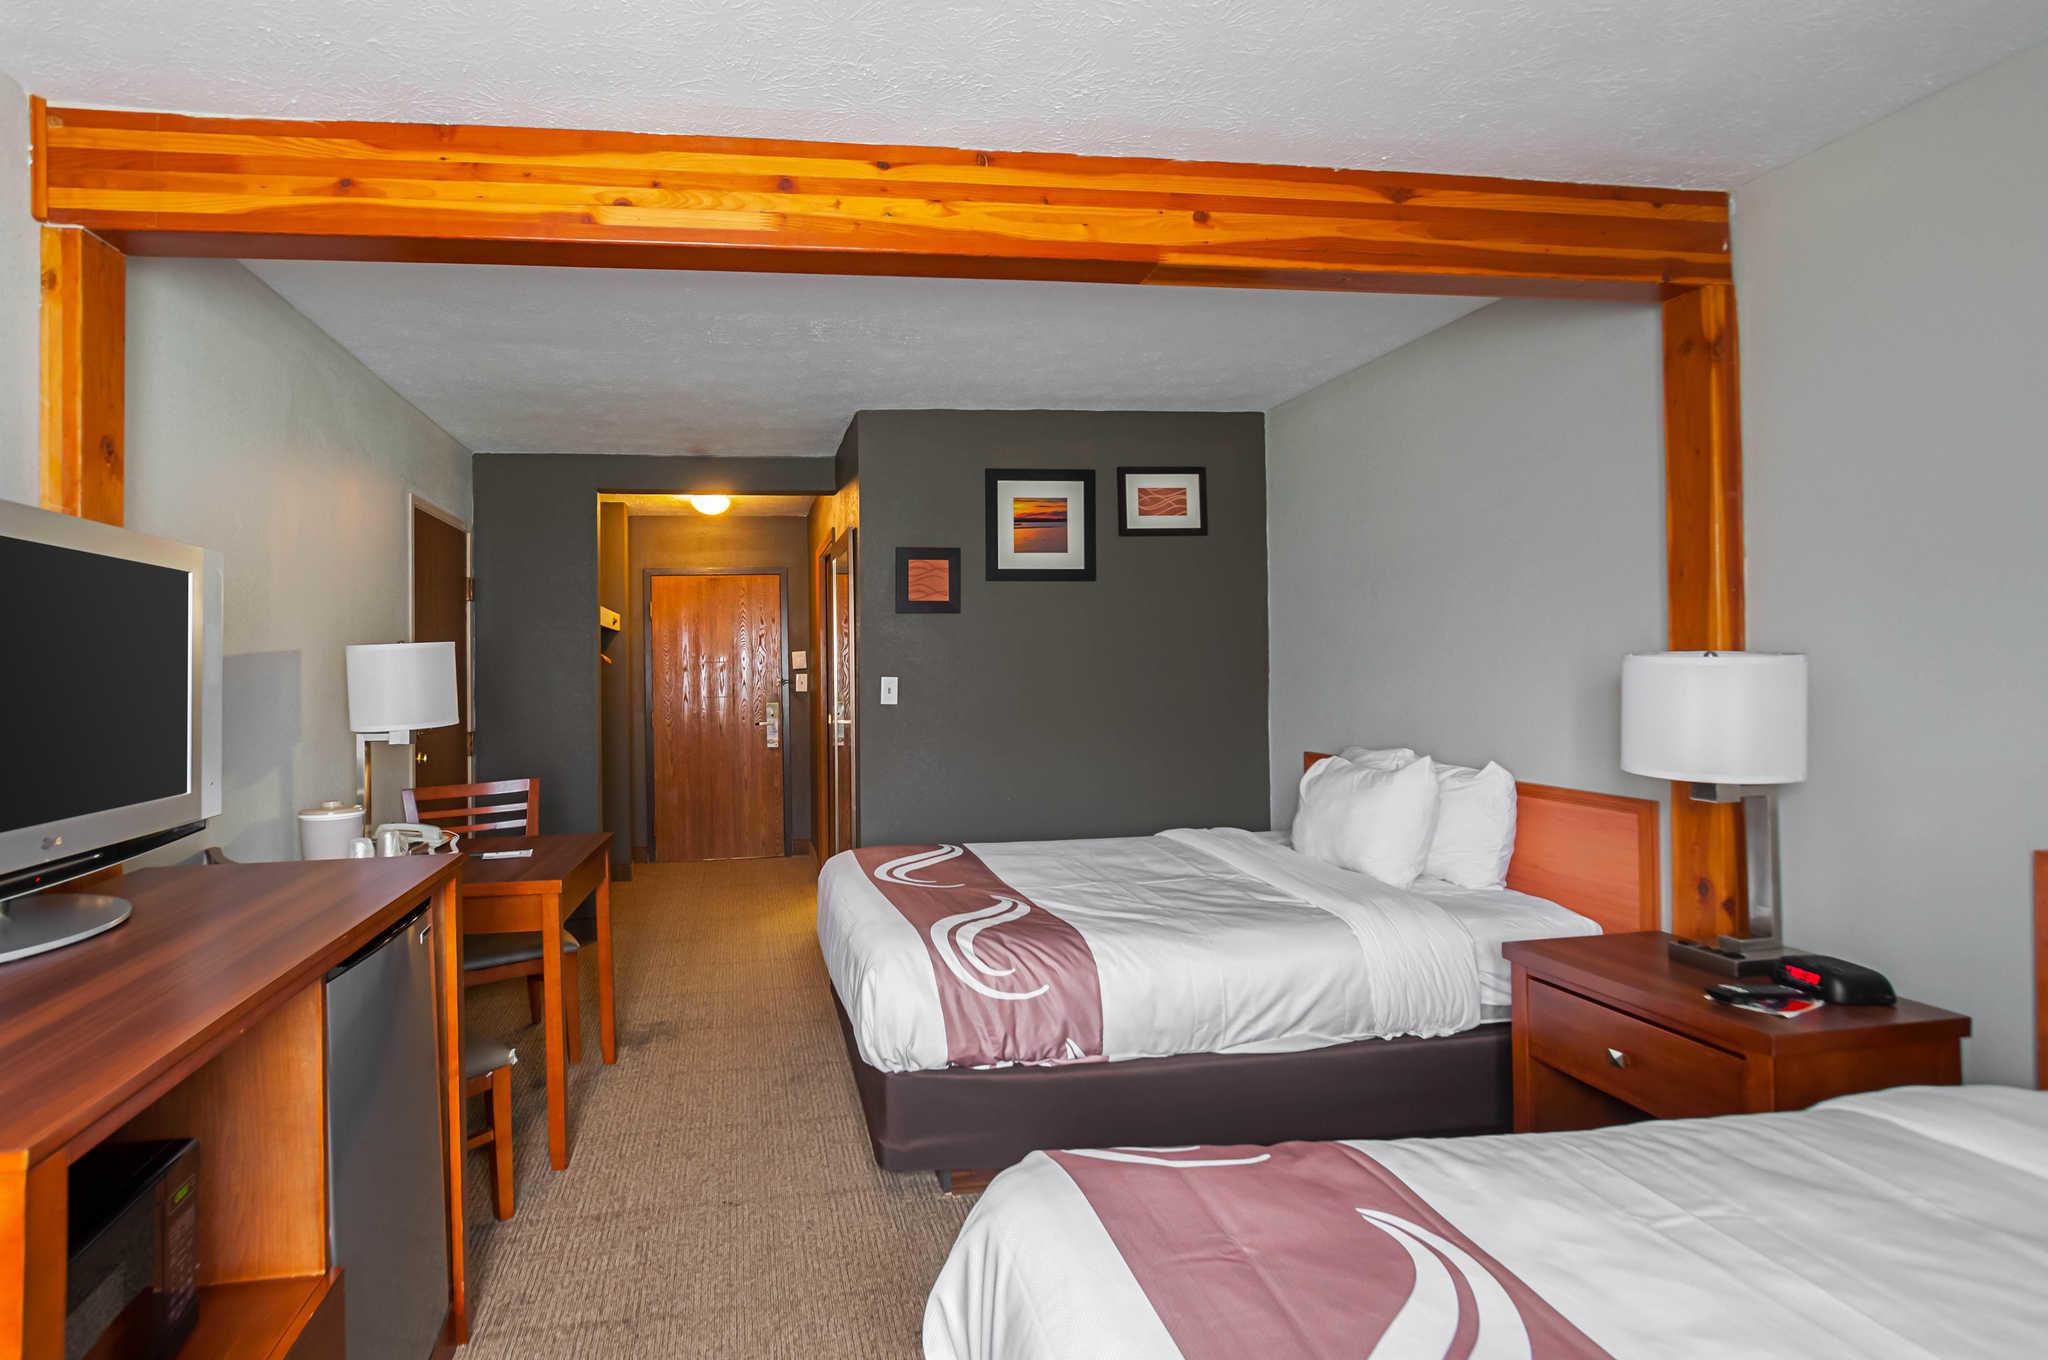 Quality Inn - Salisbury, MD - Business Directory